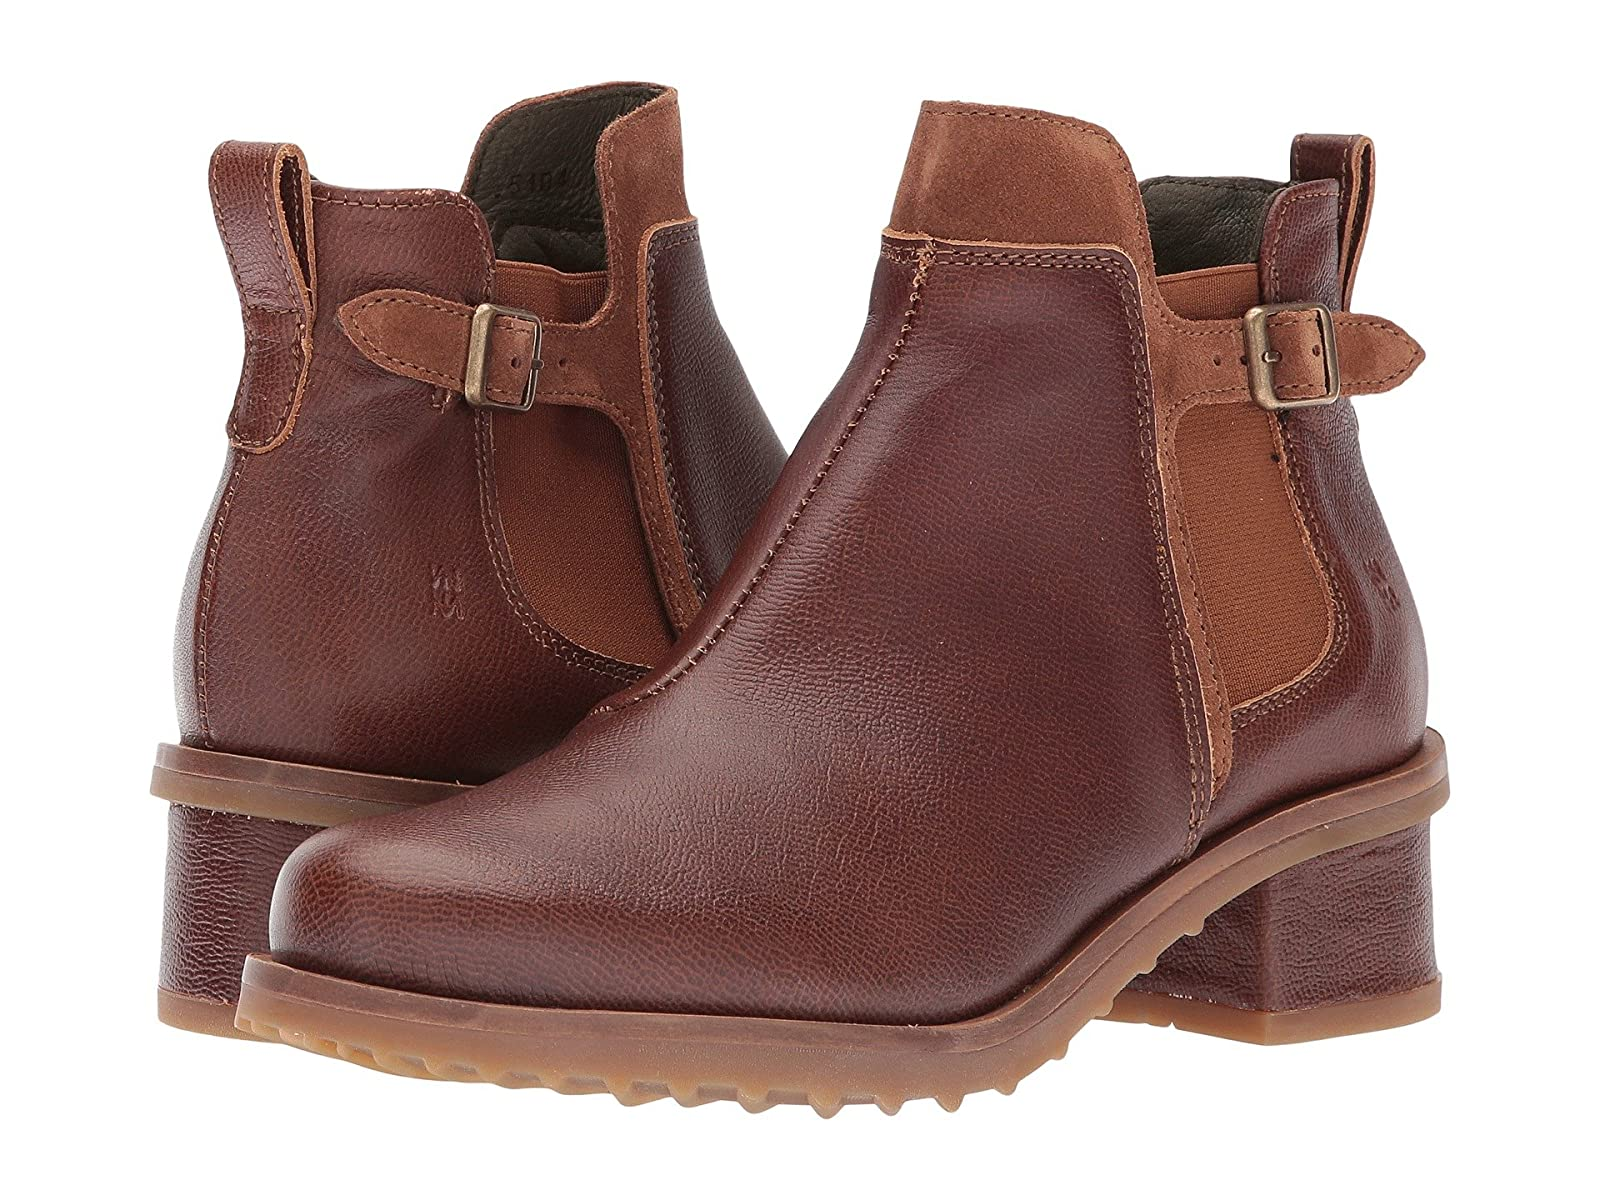 El Naturalista Kentia N5104Cheap and distinctive eye-catching shoes